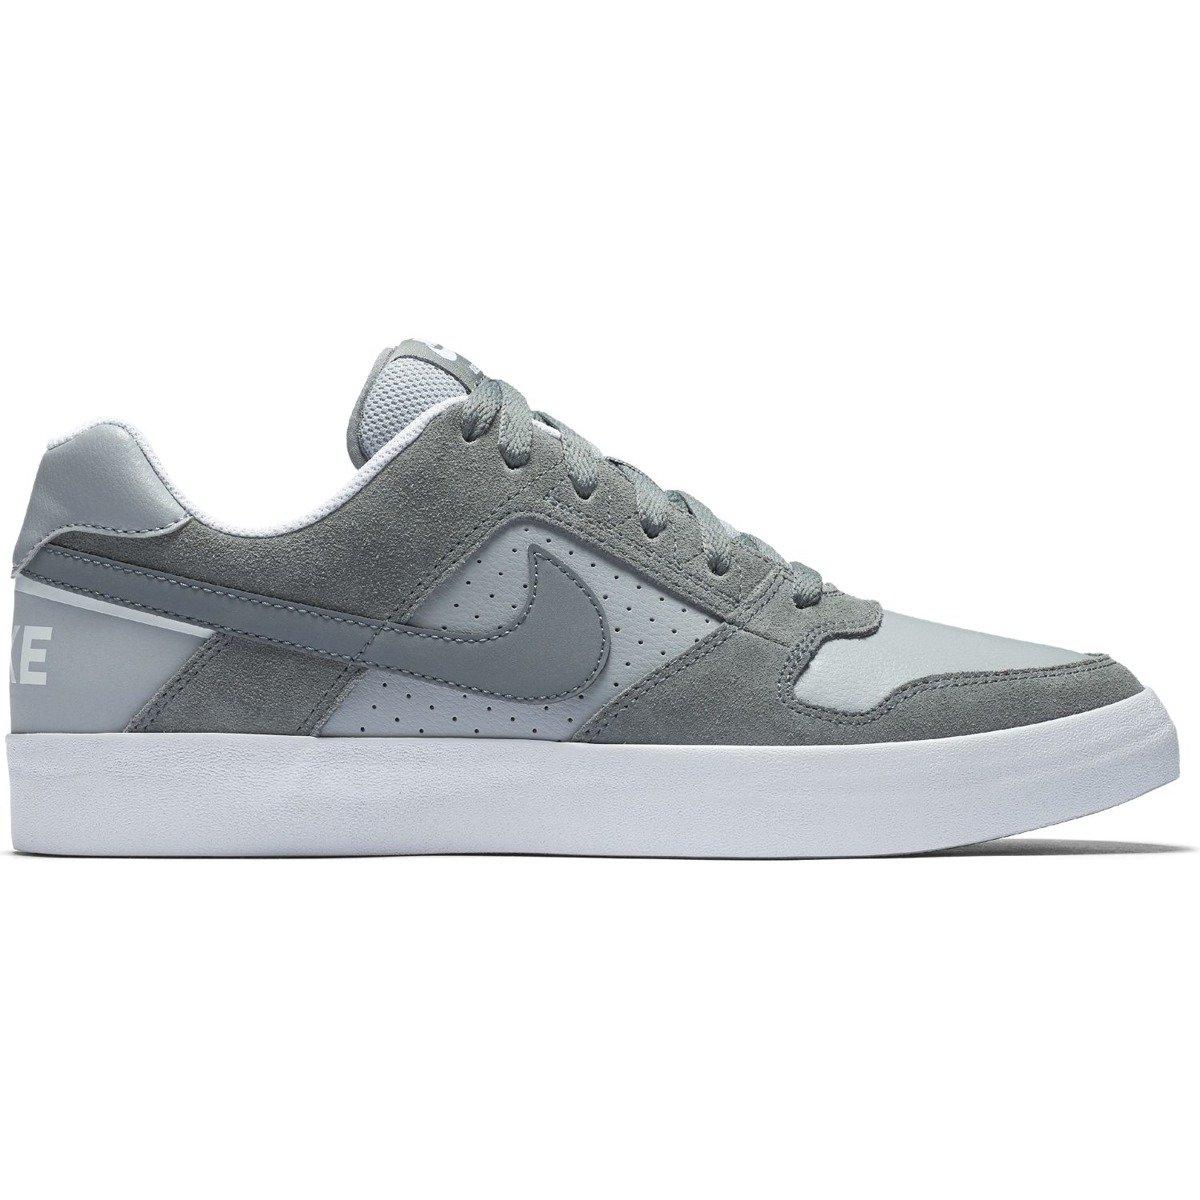 c16045f1d61c2d nike sb delta force vulc cool grey cool grey-wolf grey-white grey ...